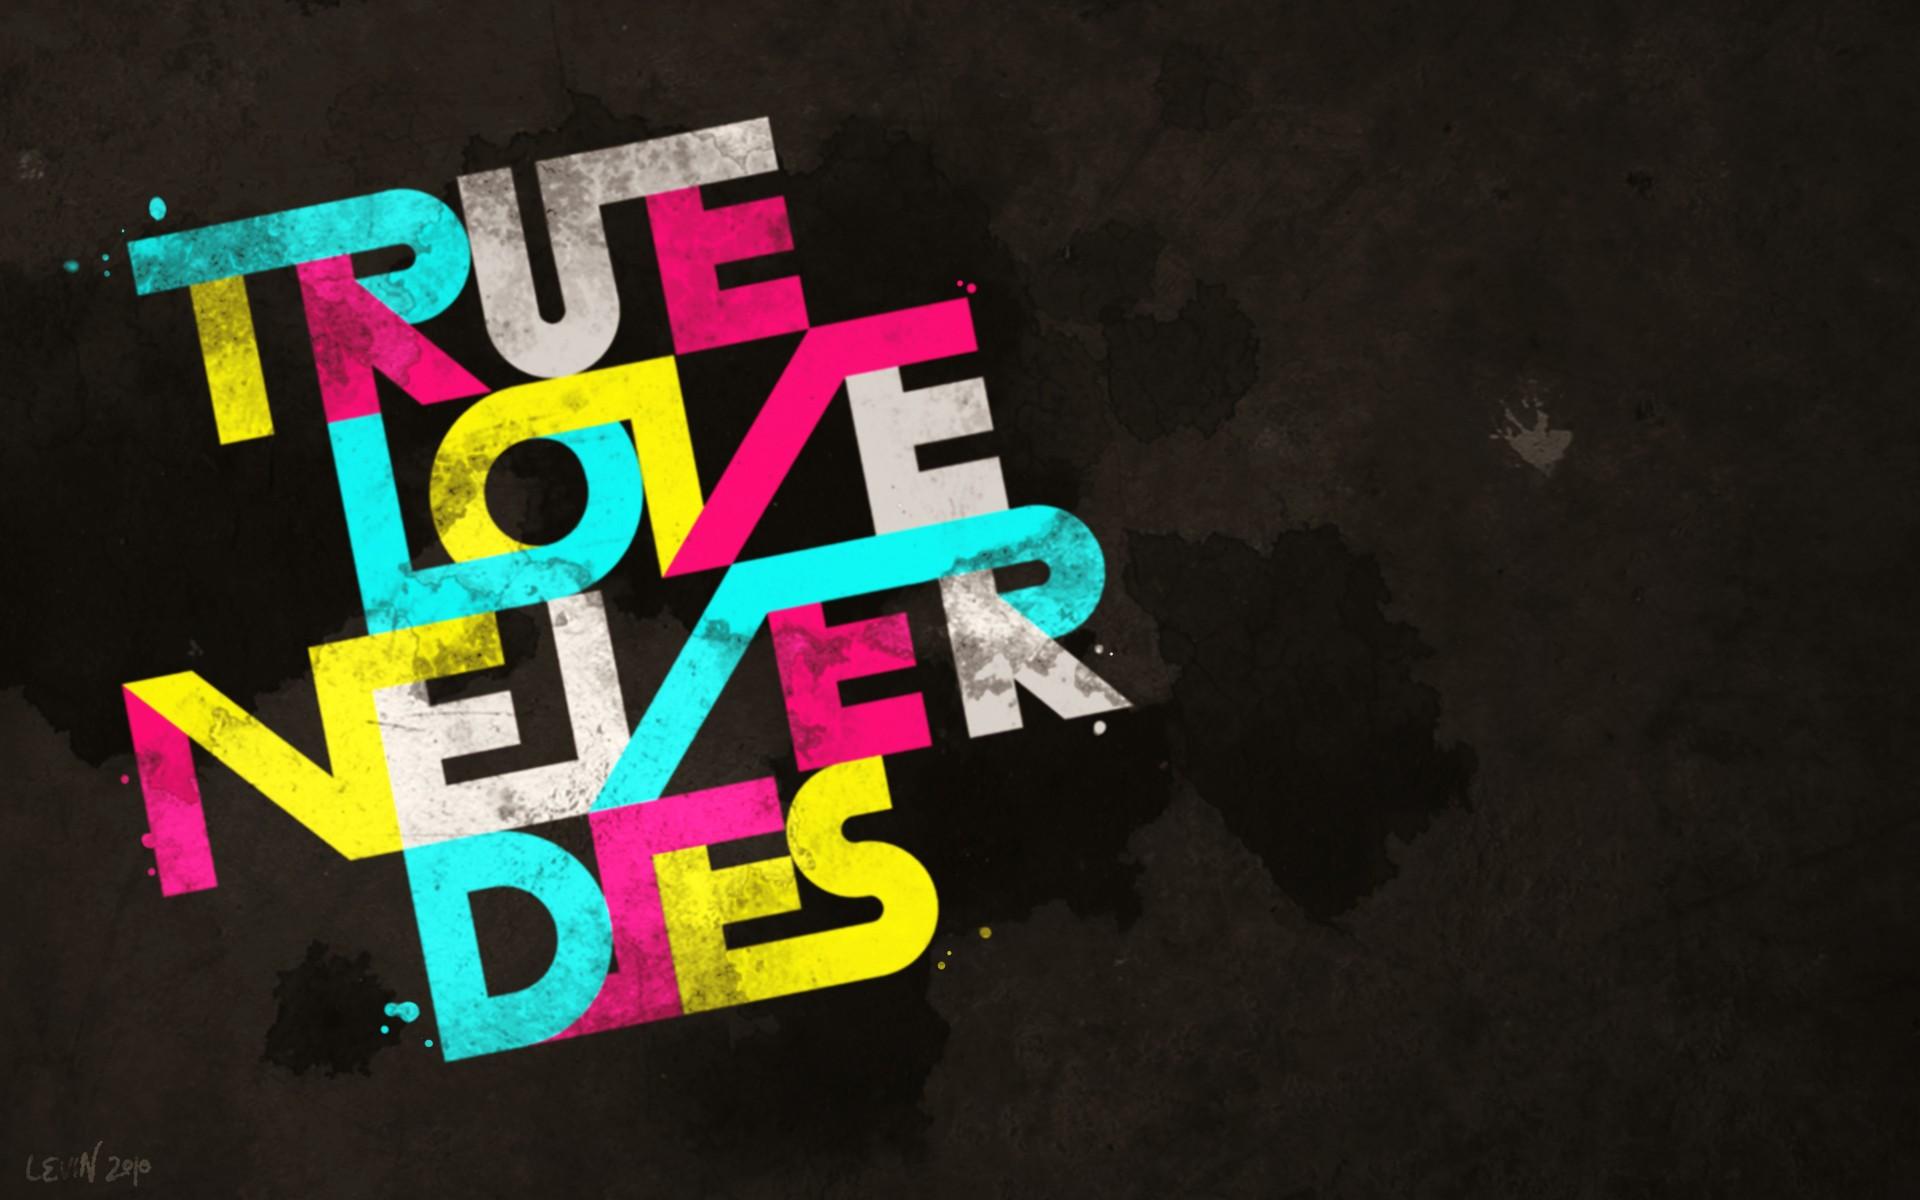 Hd wallpaper of love - True Love Quotes Wallpapers Hd Wallpaper Of Love Hdwallpaper2013 Com